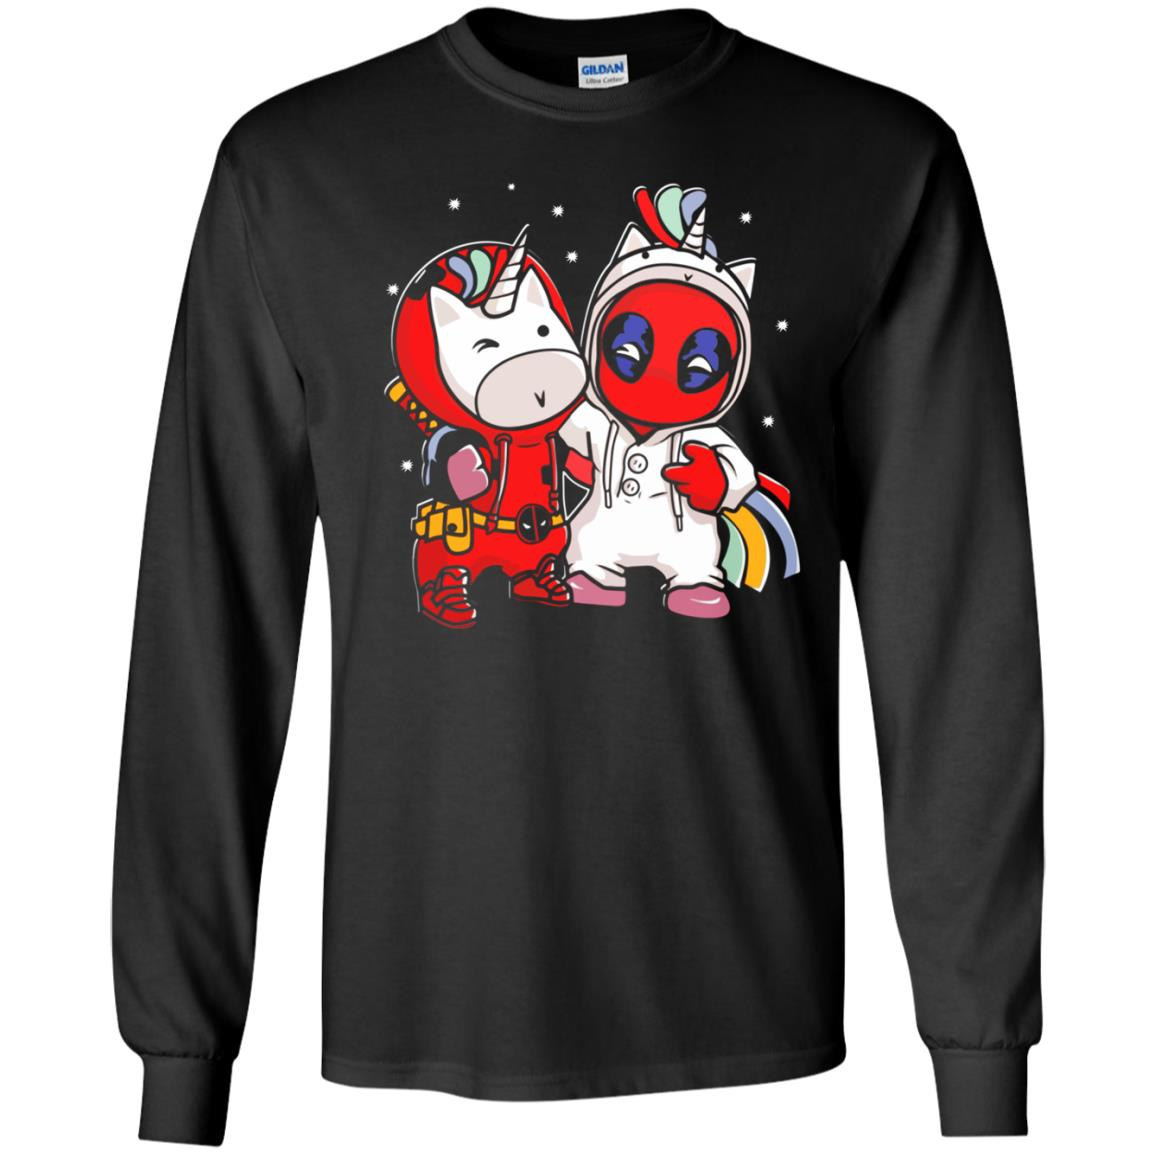 image 1003 - Deadpool swap Unicorn shirt, hoodie, sweater